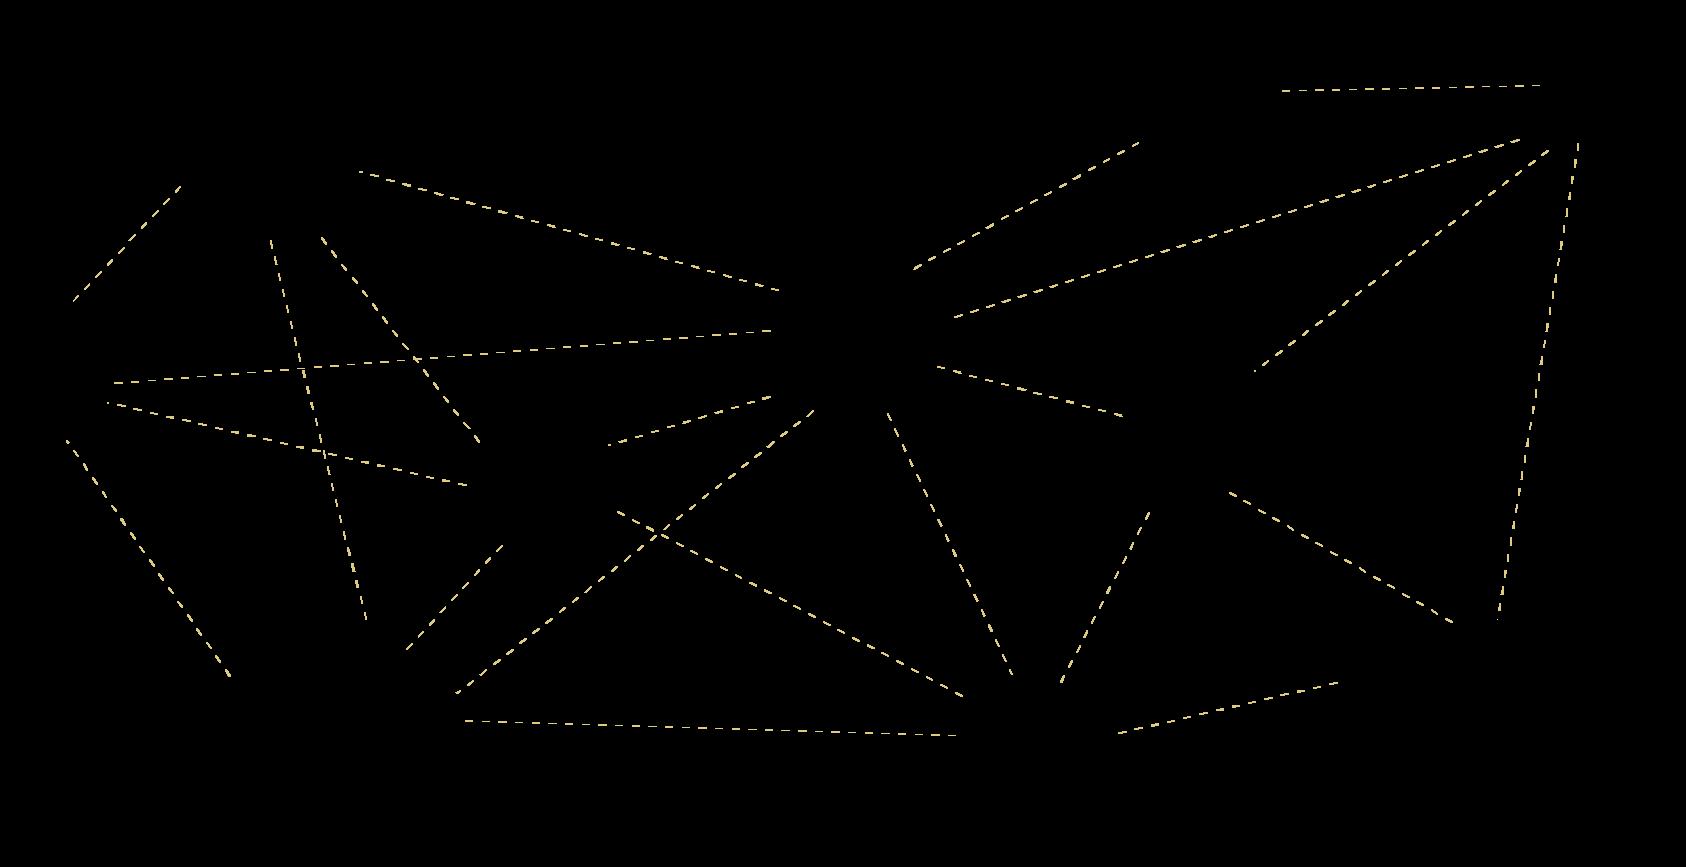 Netzwerk_s